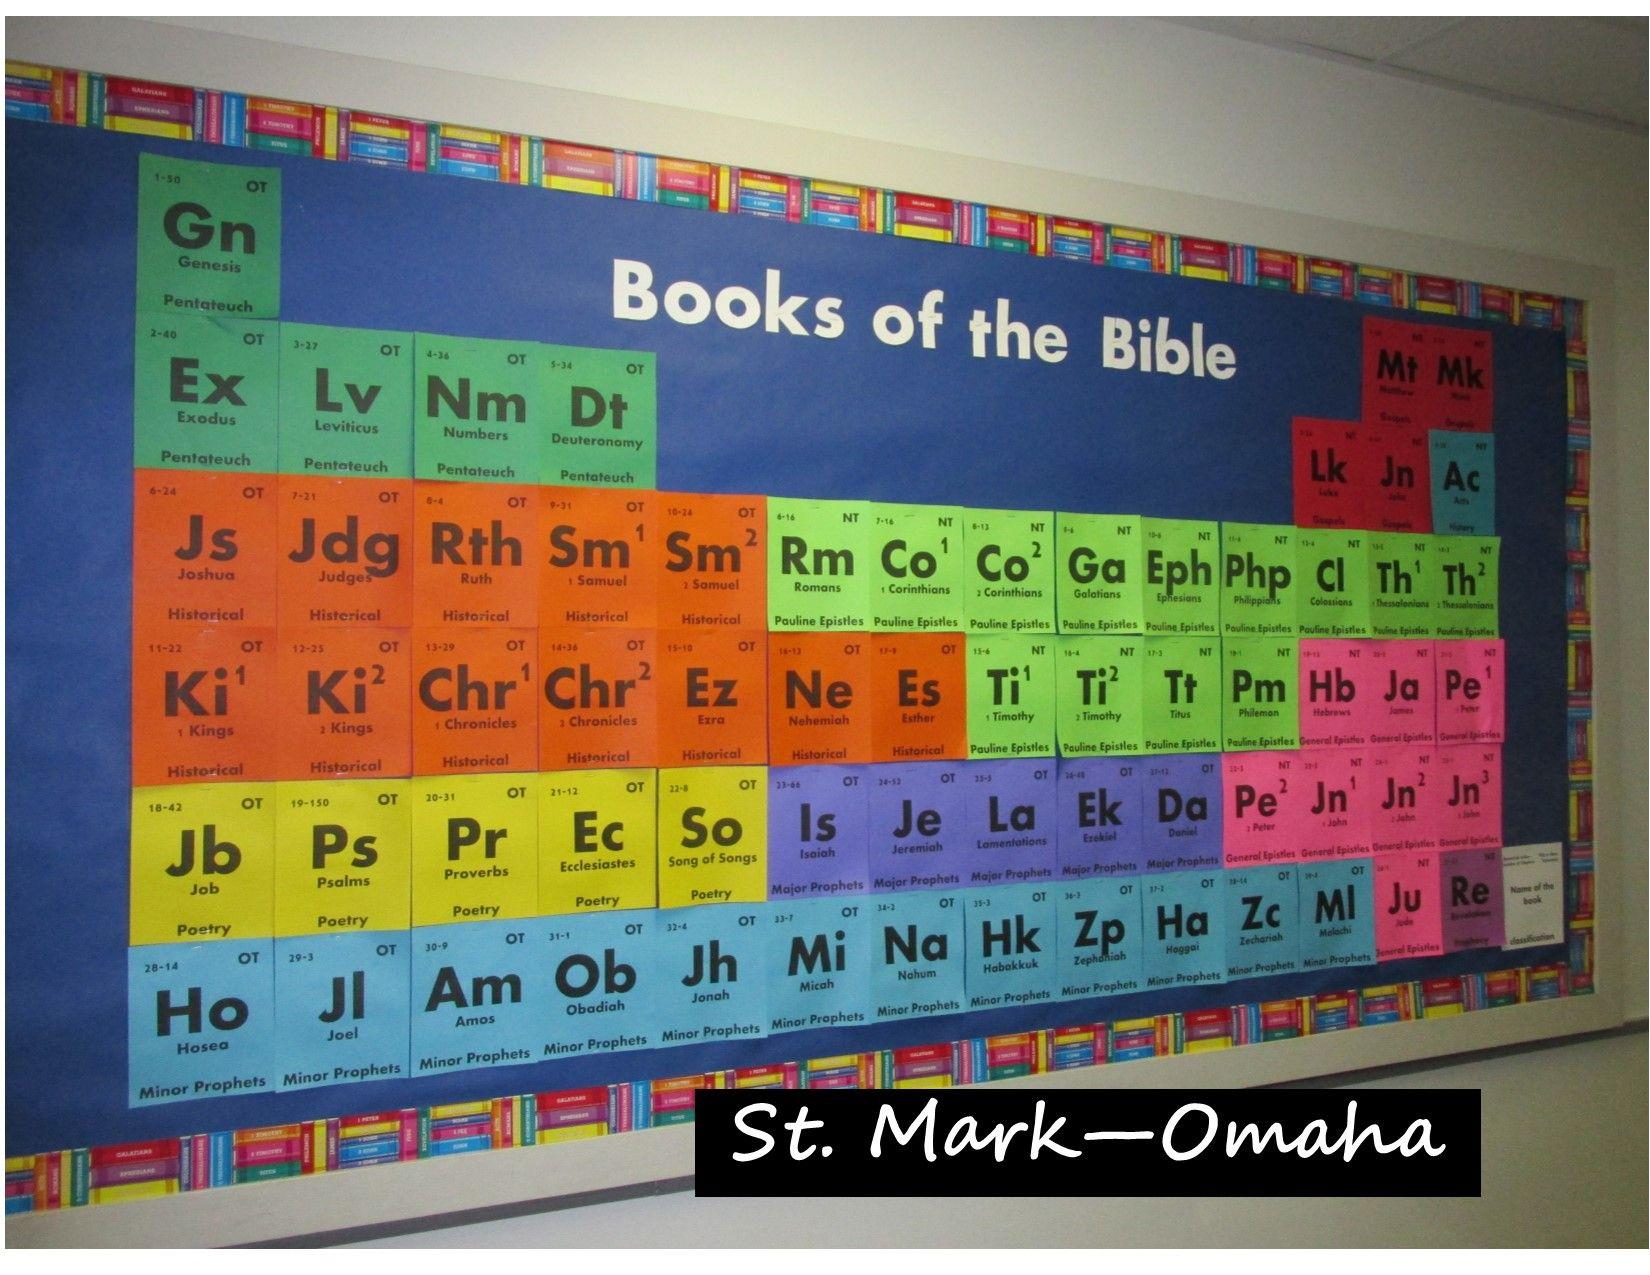 Sunday School Bulletin Board - Books Of Bible In